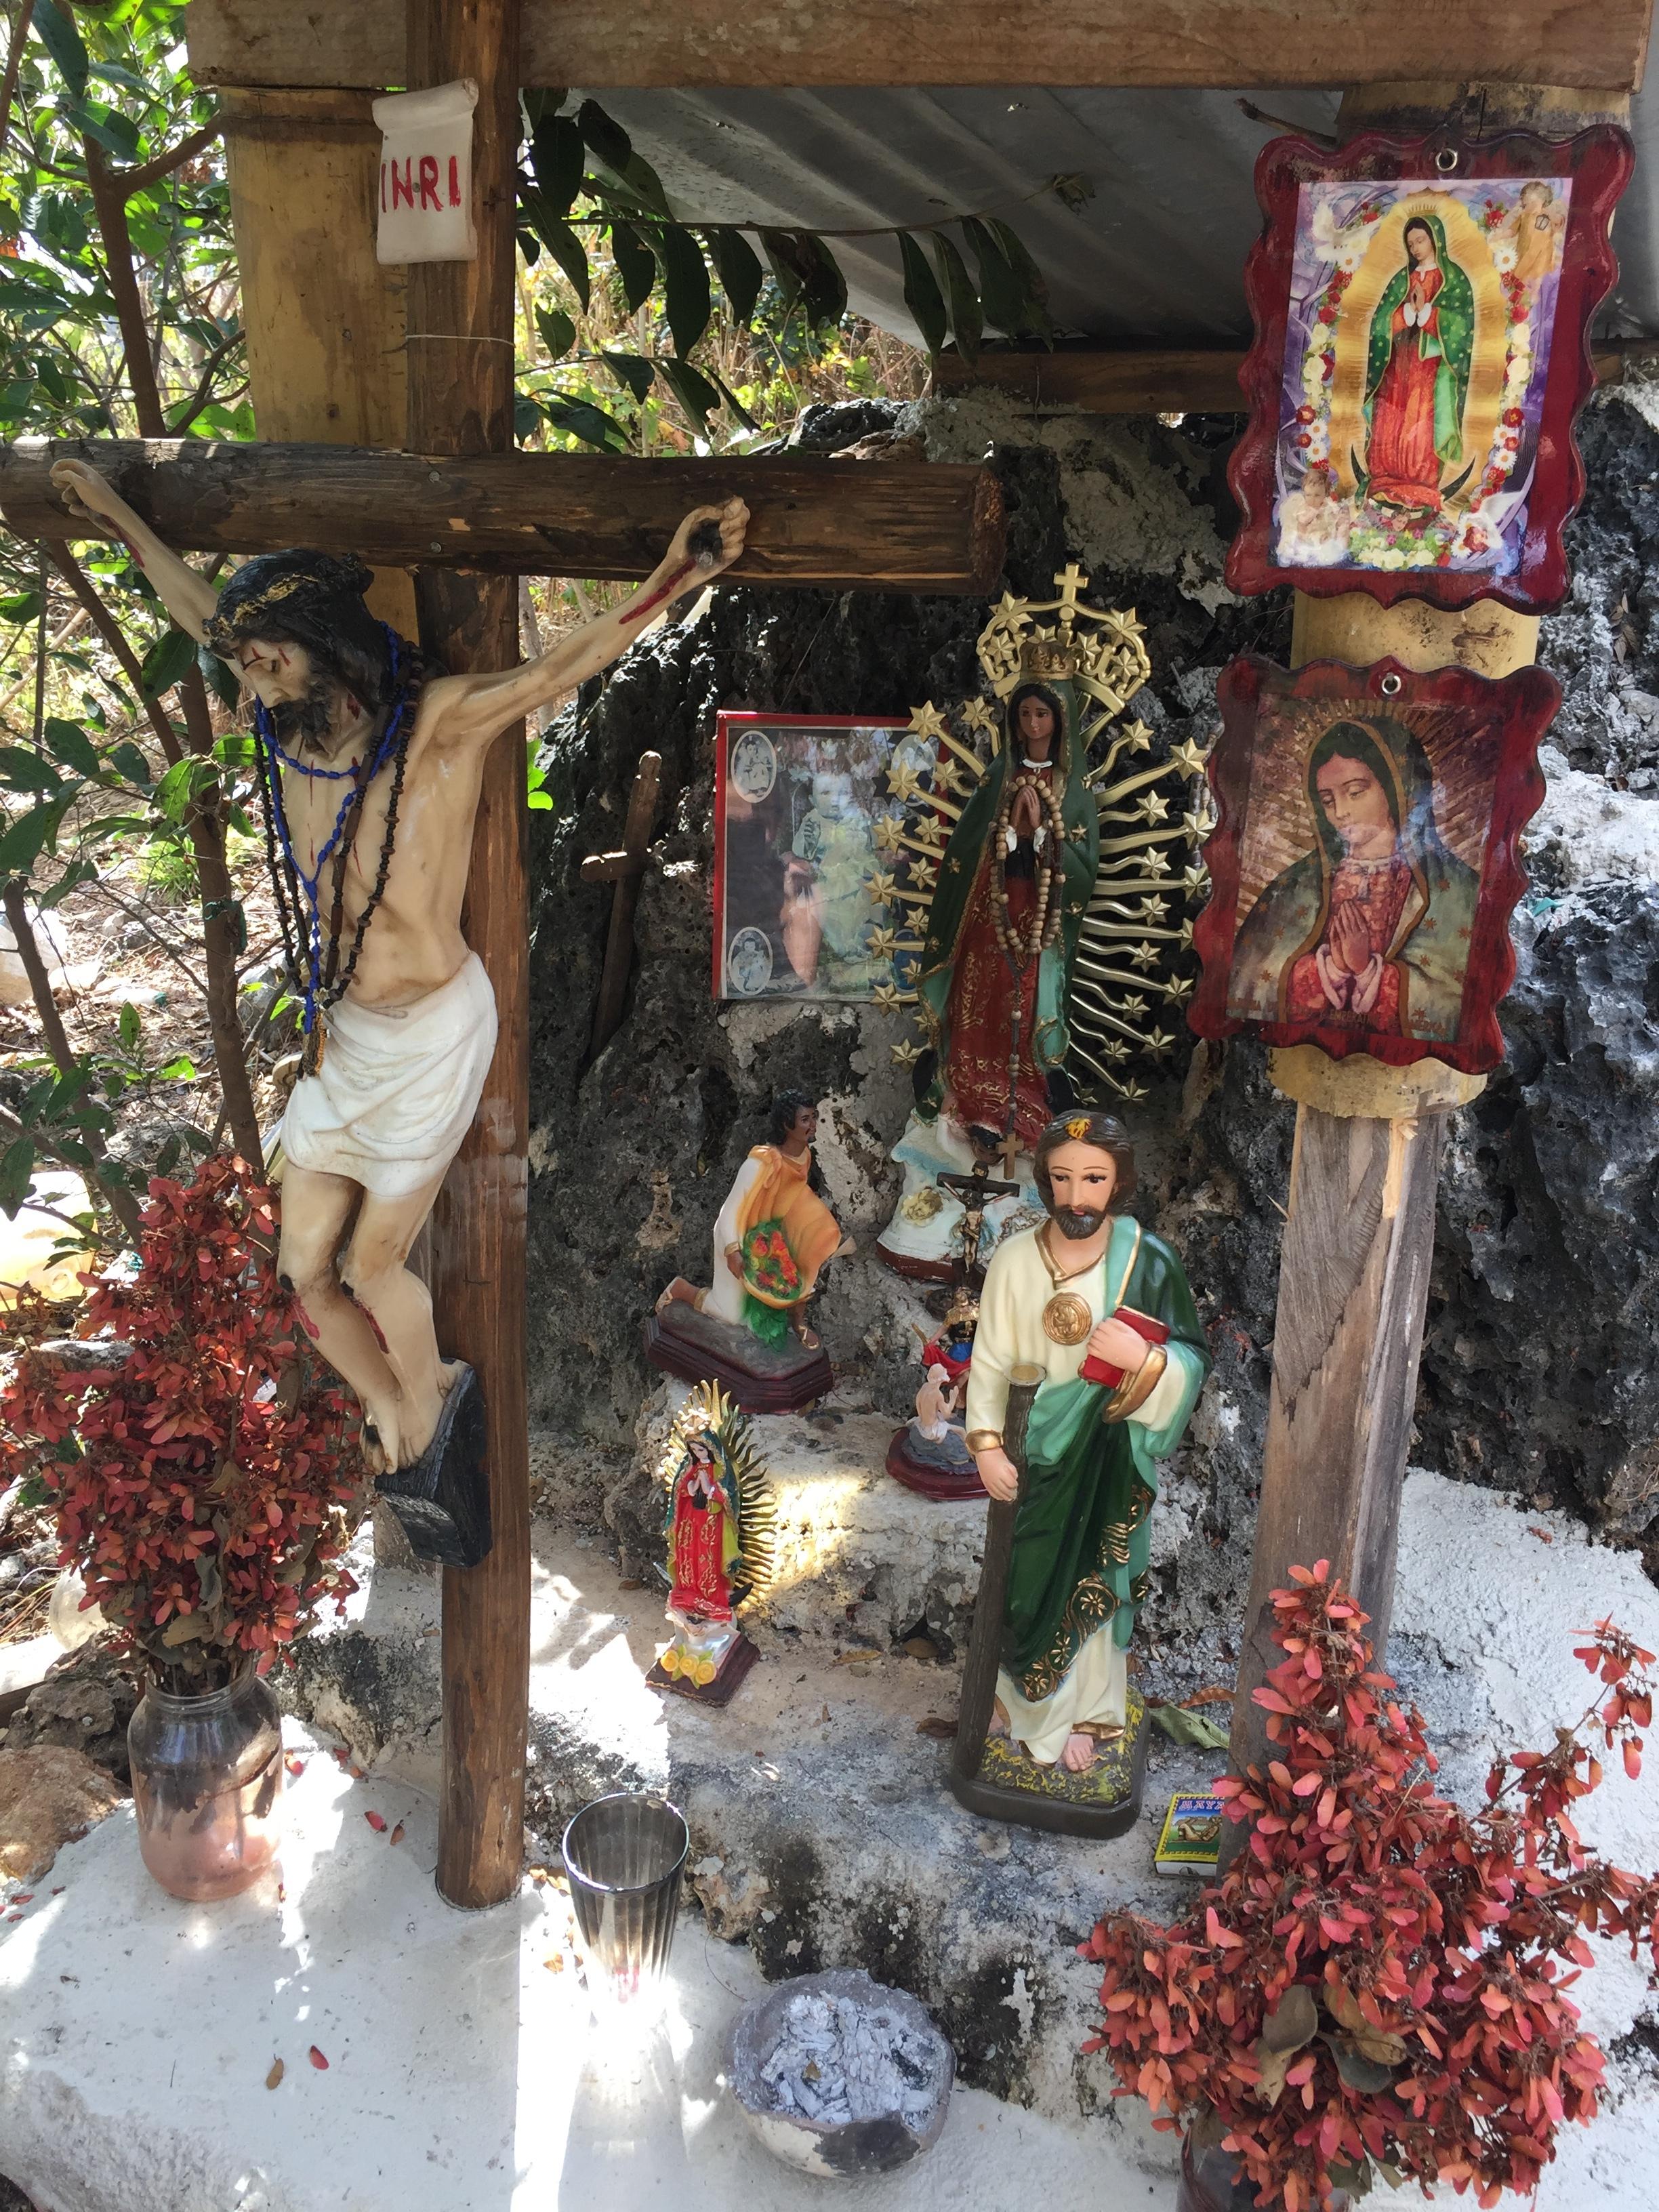 The family altar